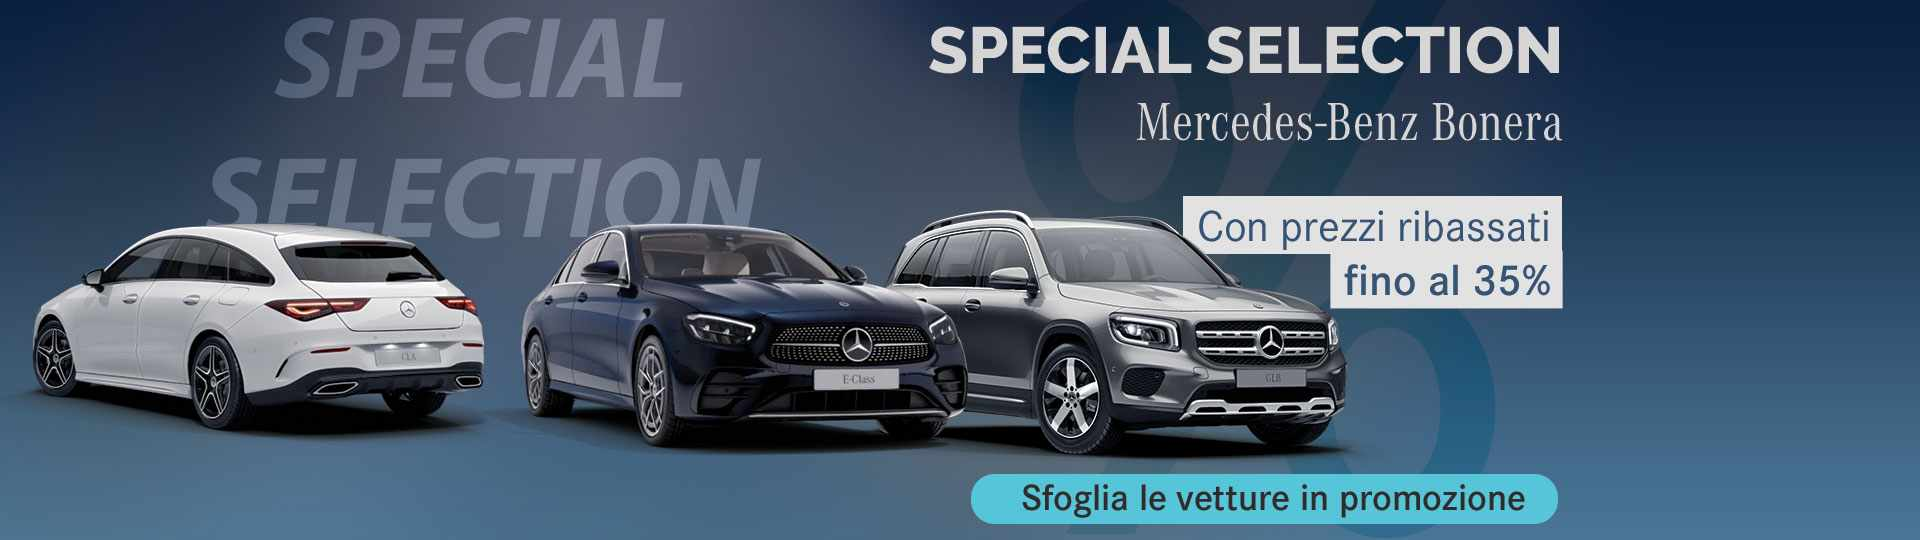 header_Special-Selection_gennaio_2021.jpg